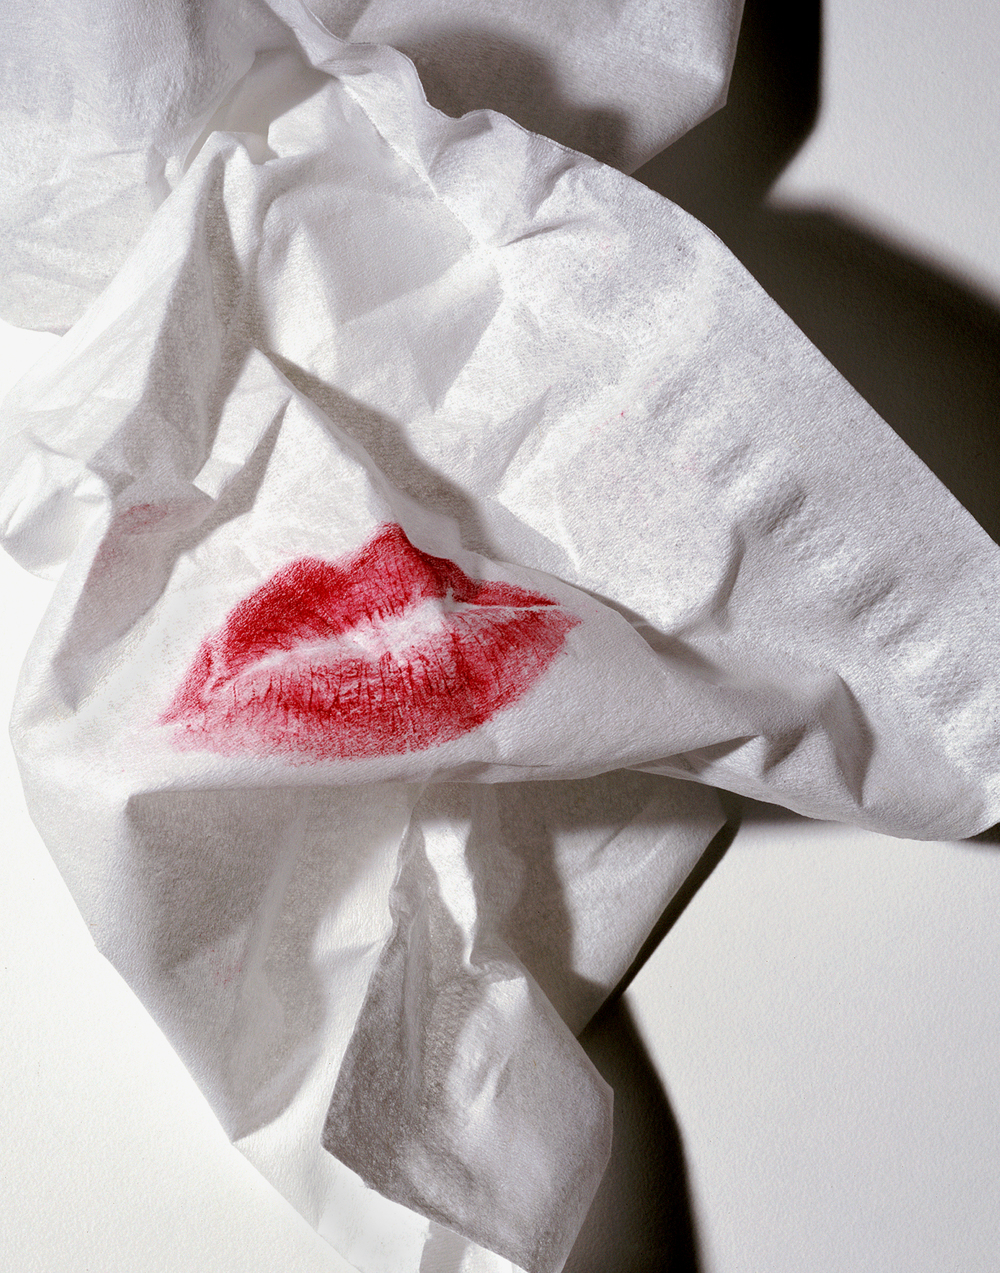 tissue final-11x14.jpg